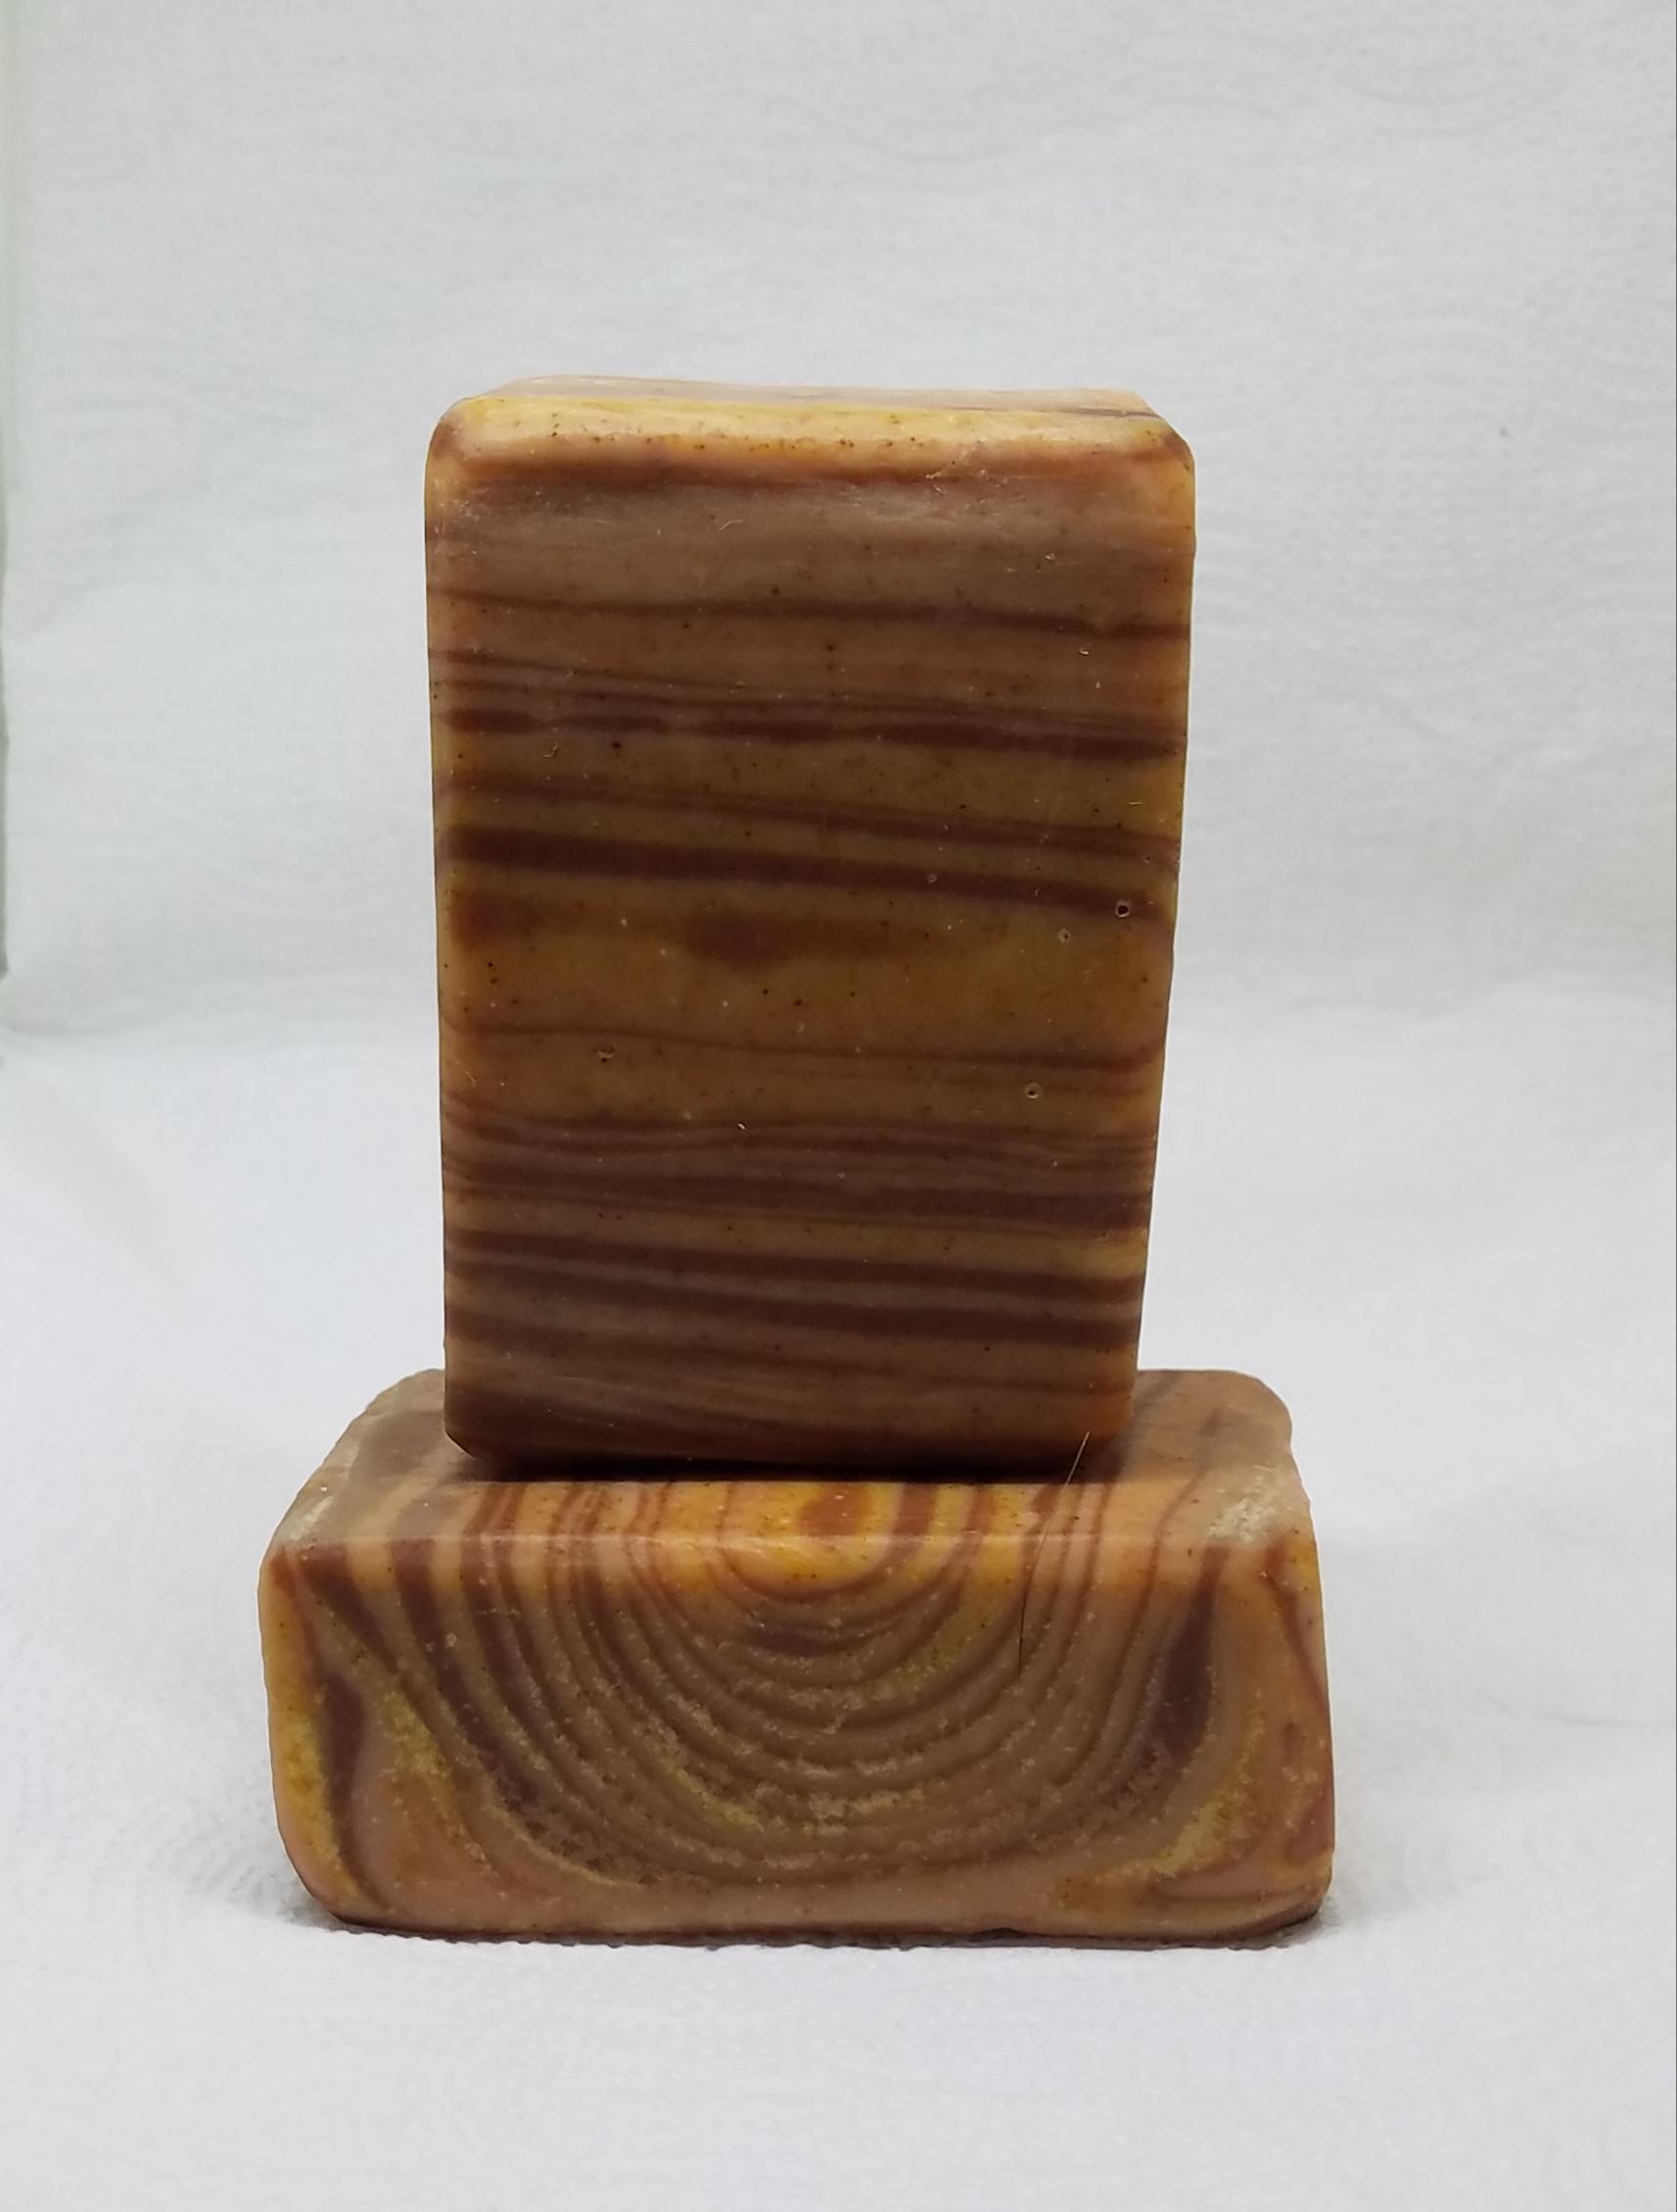 mahogany and teak wood grain goat s milk soap